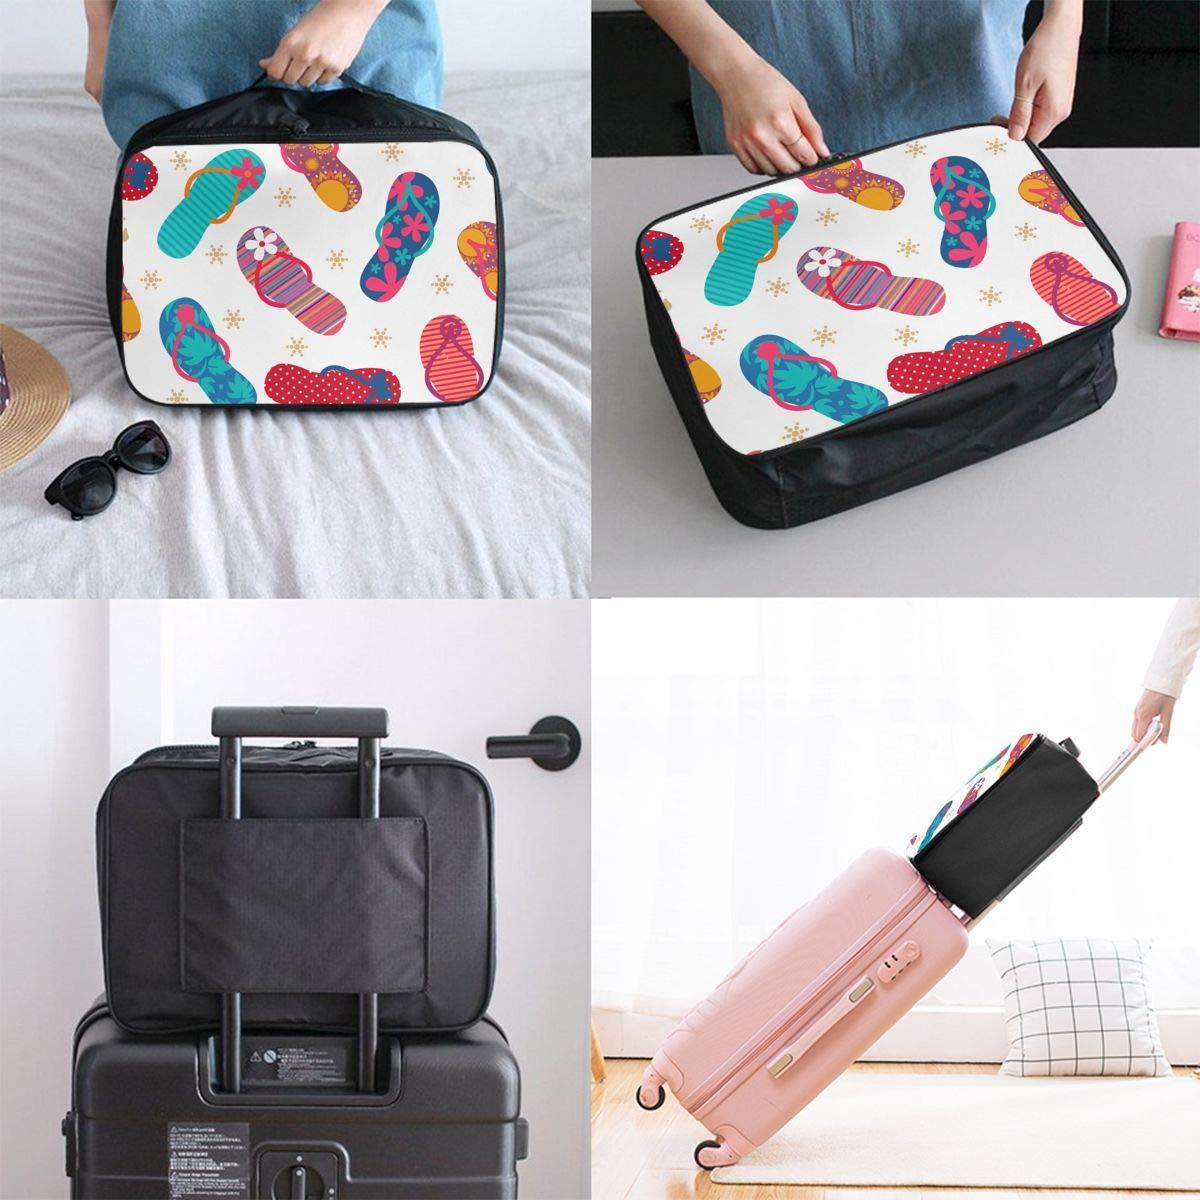 Vacation Hiking Hand Bag In Trolley Handle Travel Duffle Bag Cool Flip Flops Slippers Weekender Bag Waterproof Foldable Nylon Luggage Duffel Bag For Sports Gym